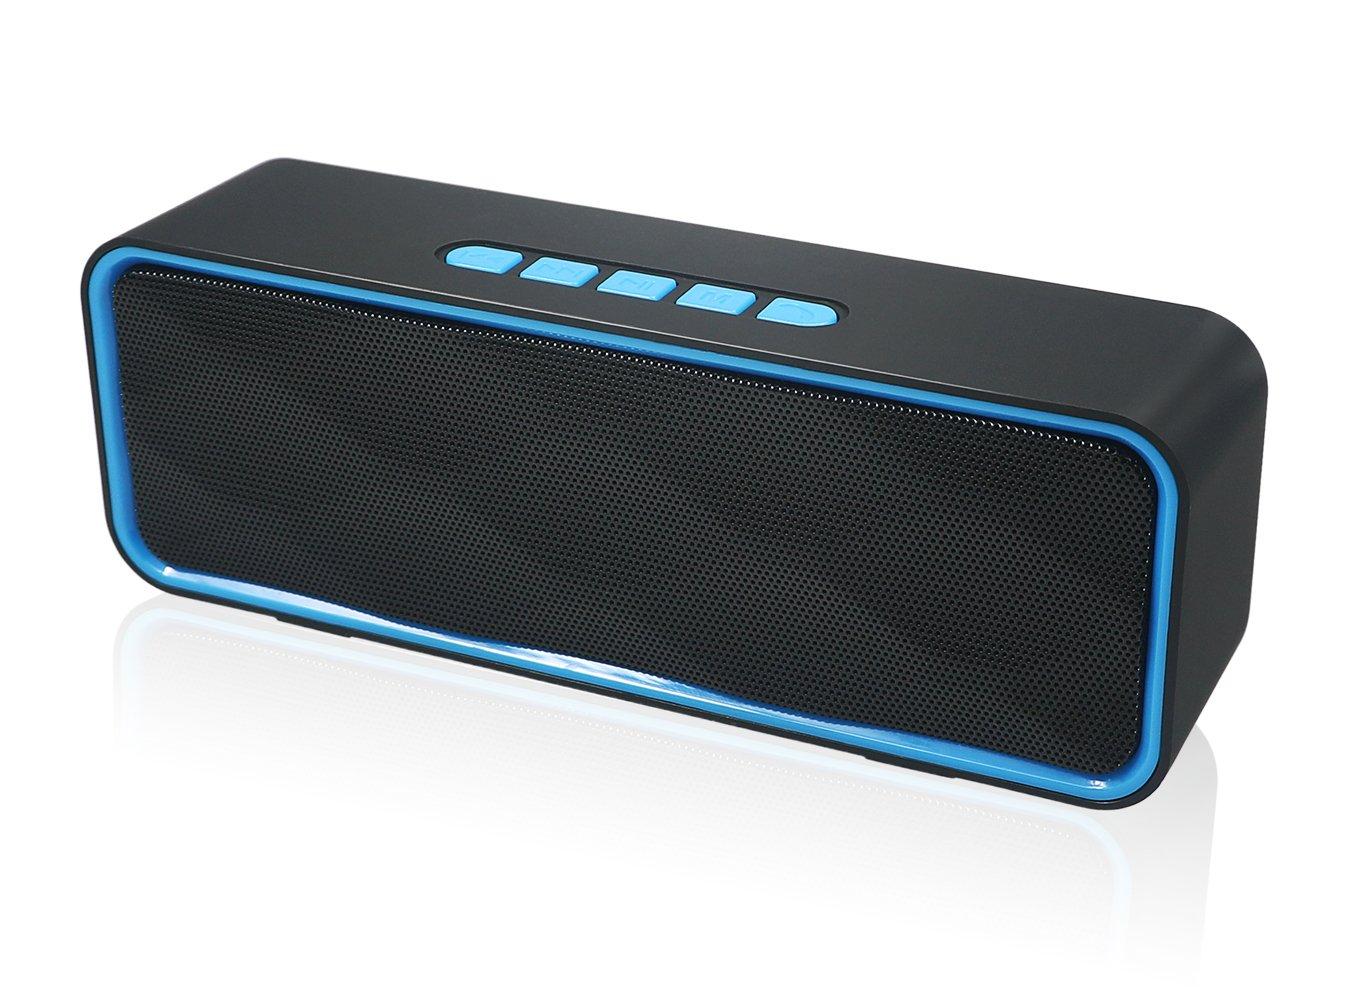 Parlante Bluetooth Totola Wireless con AUX/USB/TF card slot